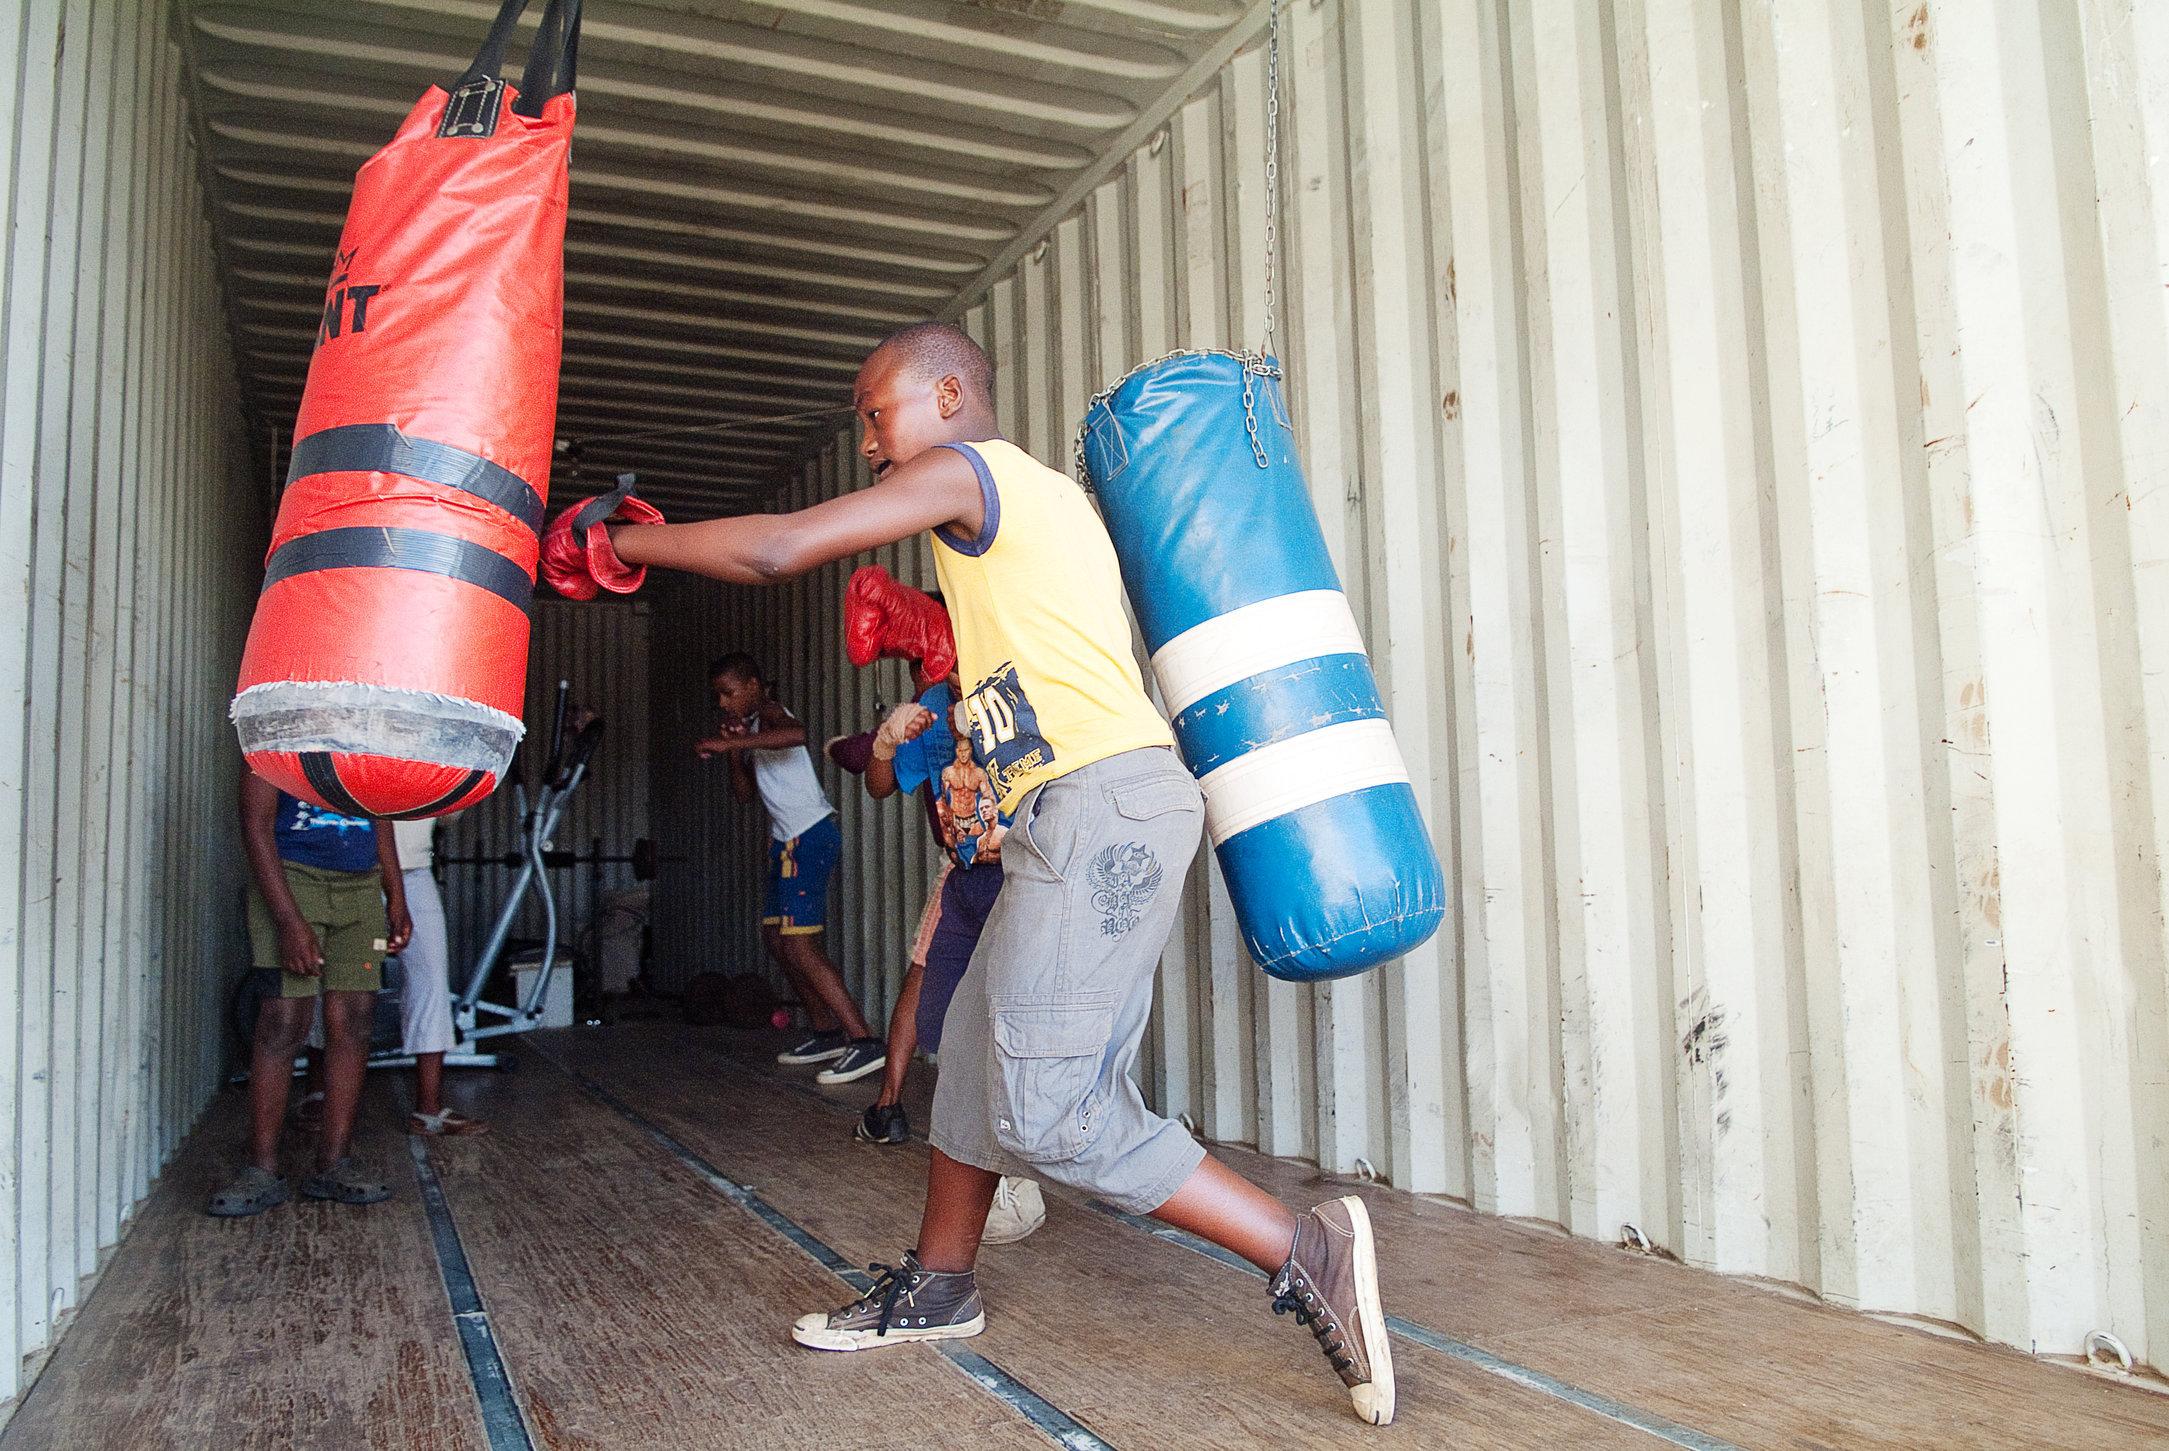 Boxing Bags I